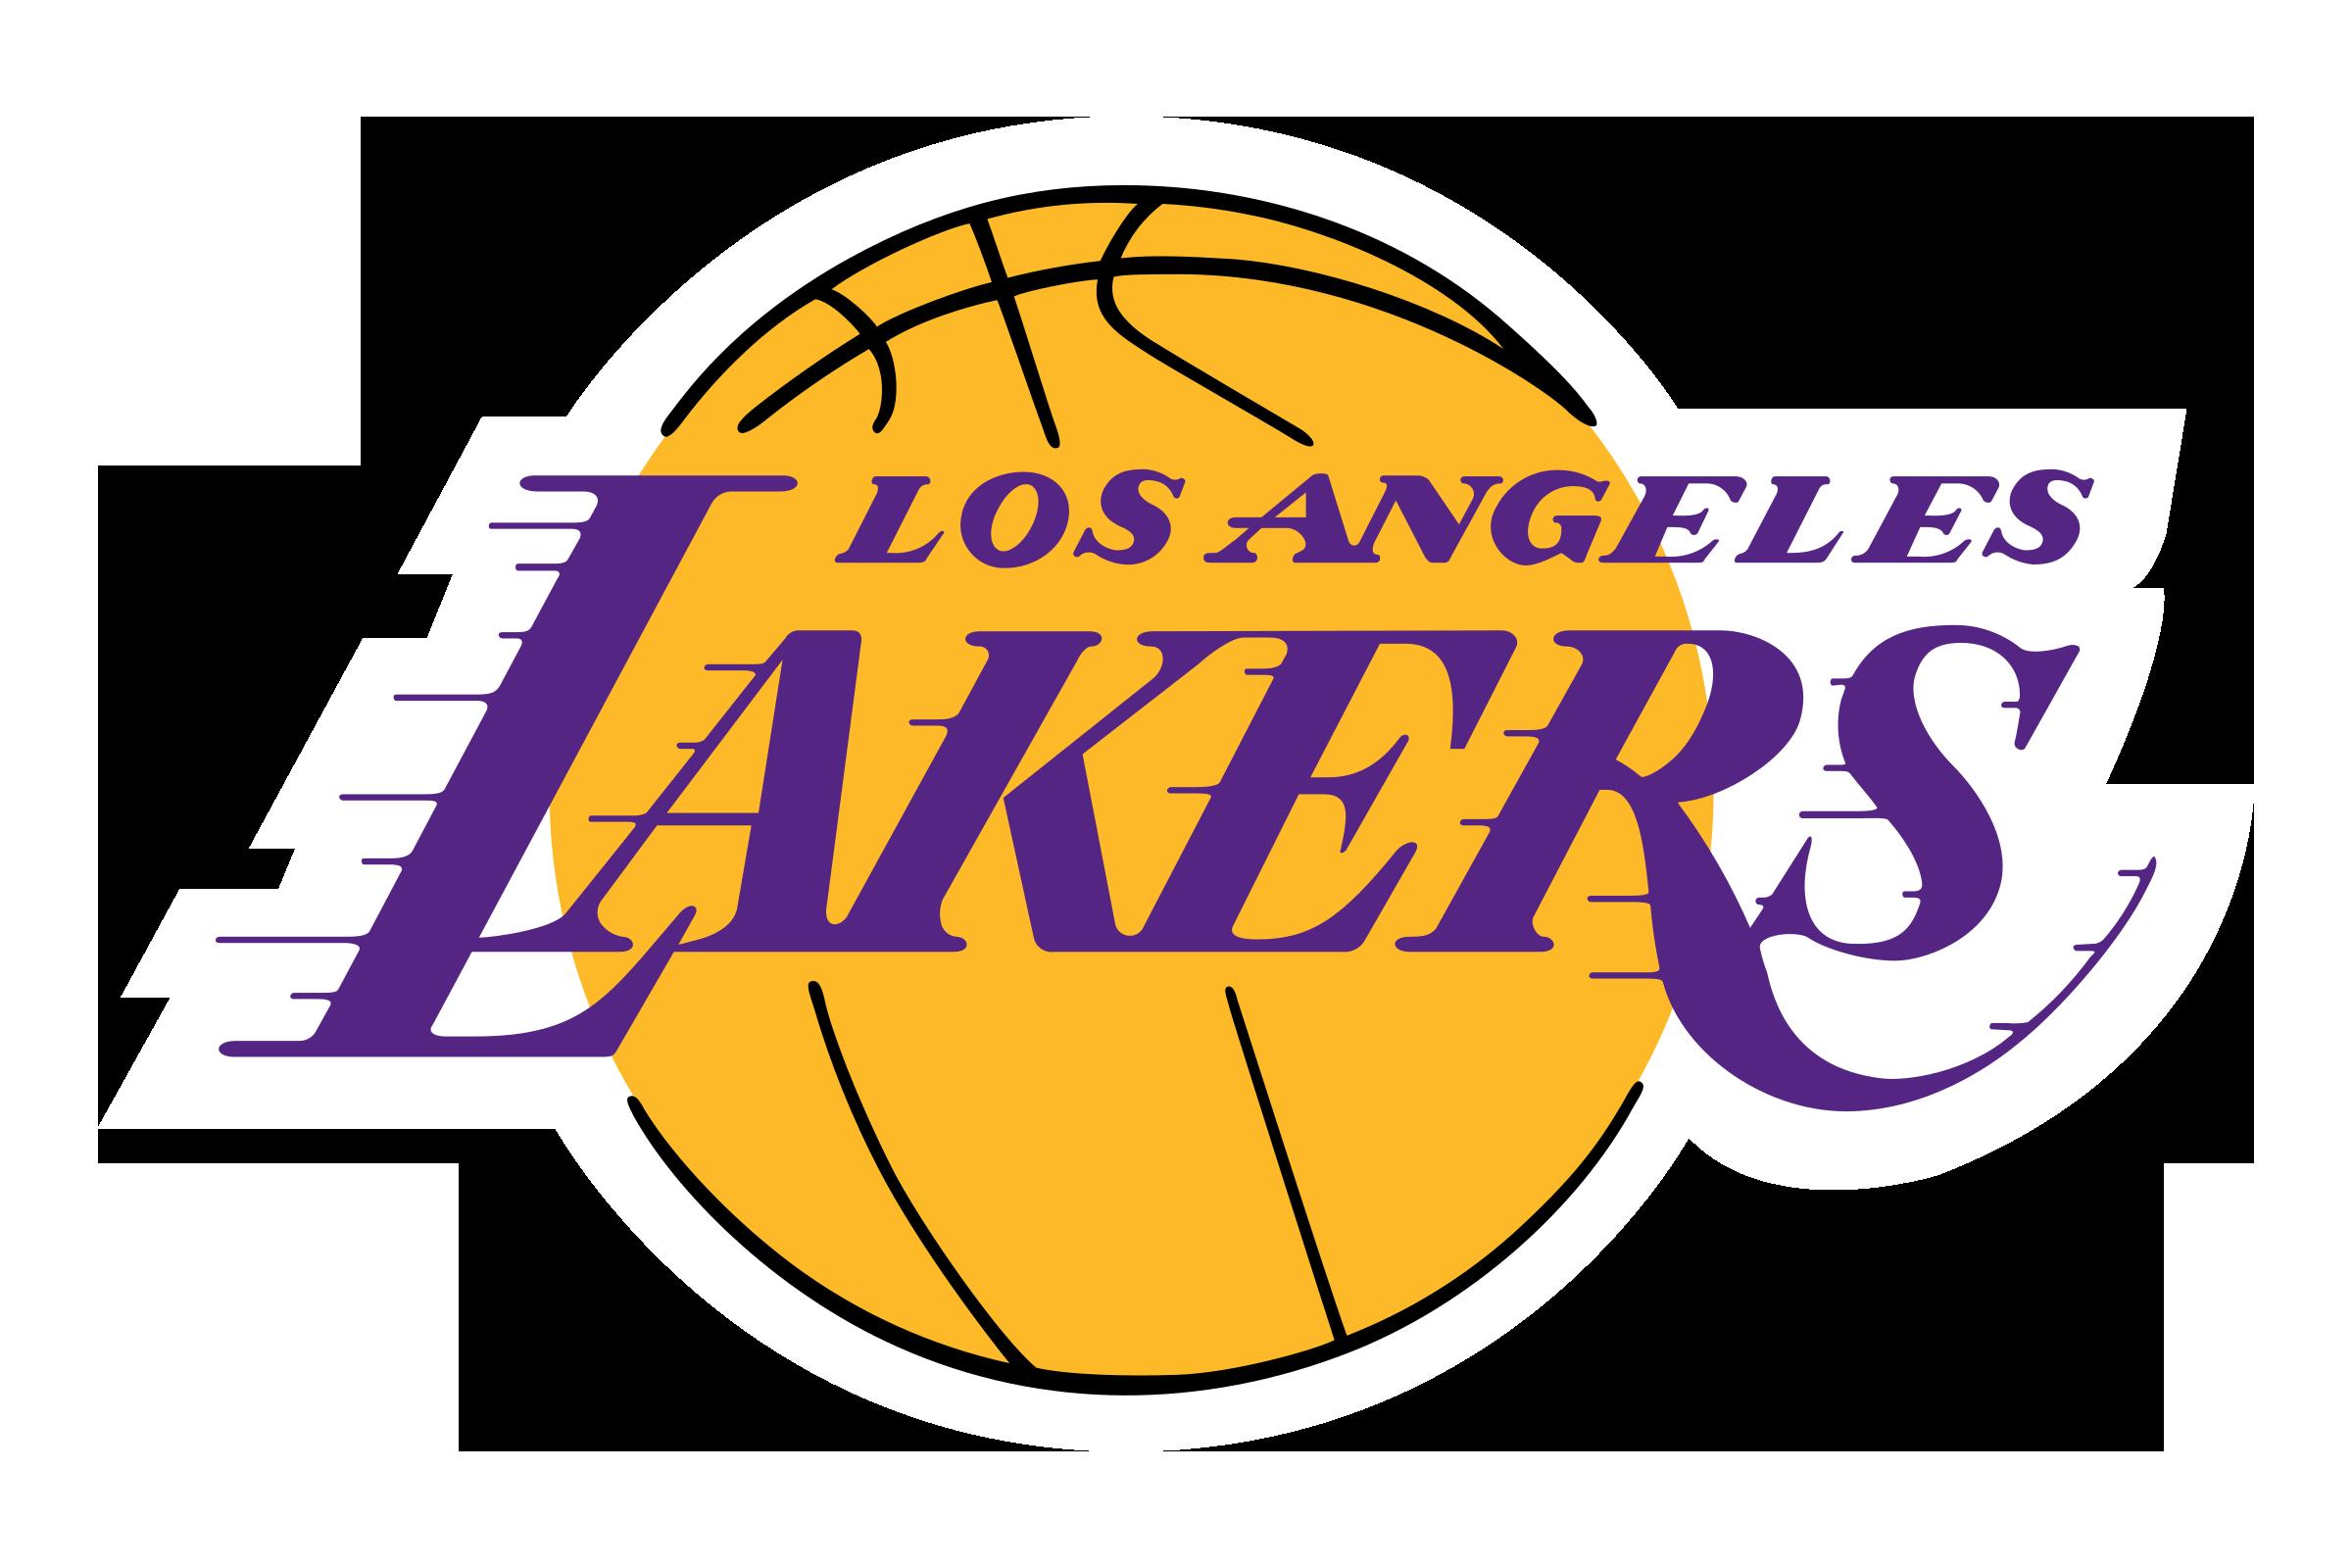 Los Angeles Lakers - 2.57% interaction rate - instagram(vs. 1.07% via league average)